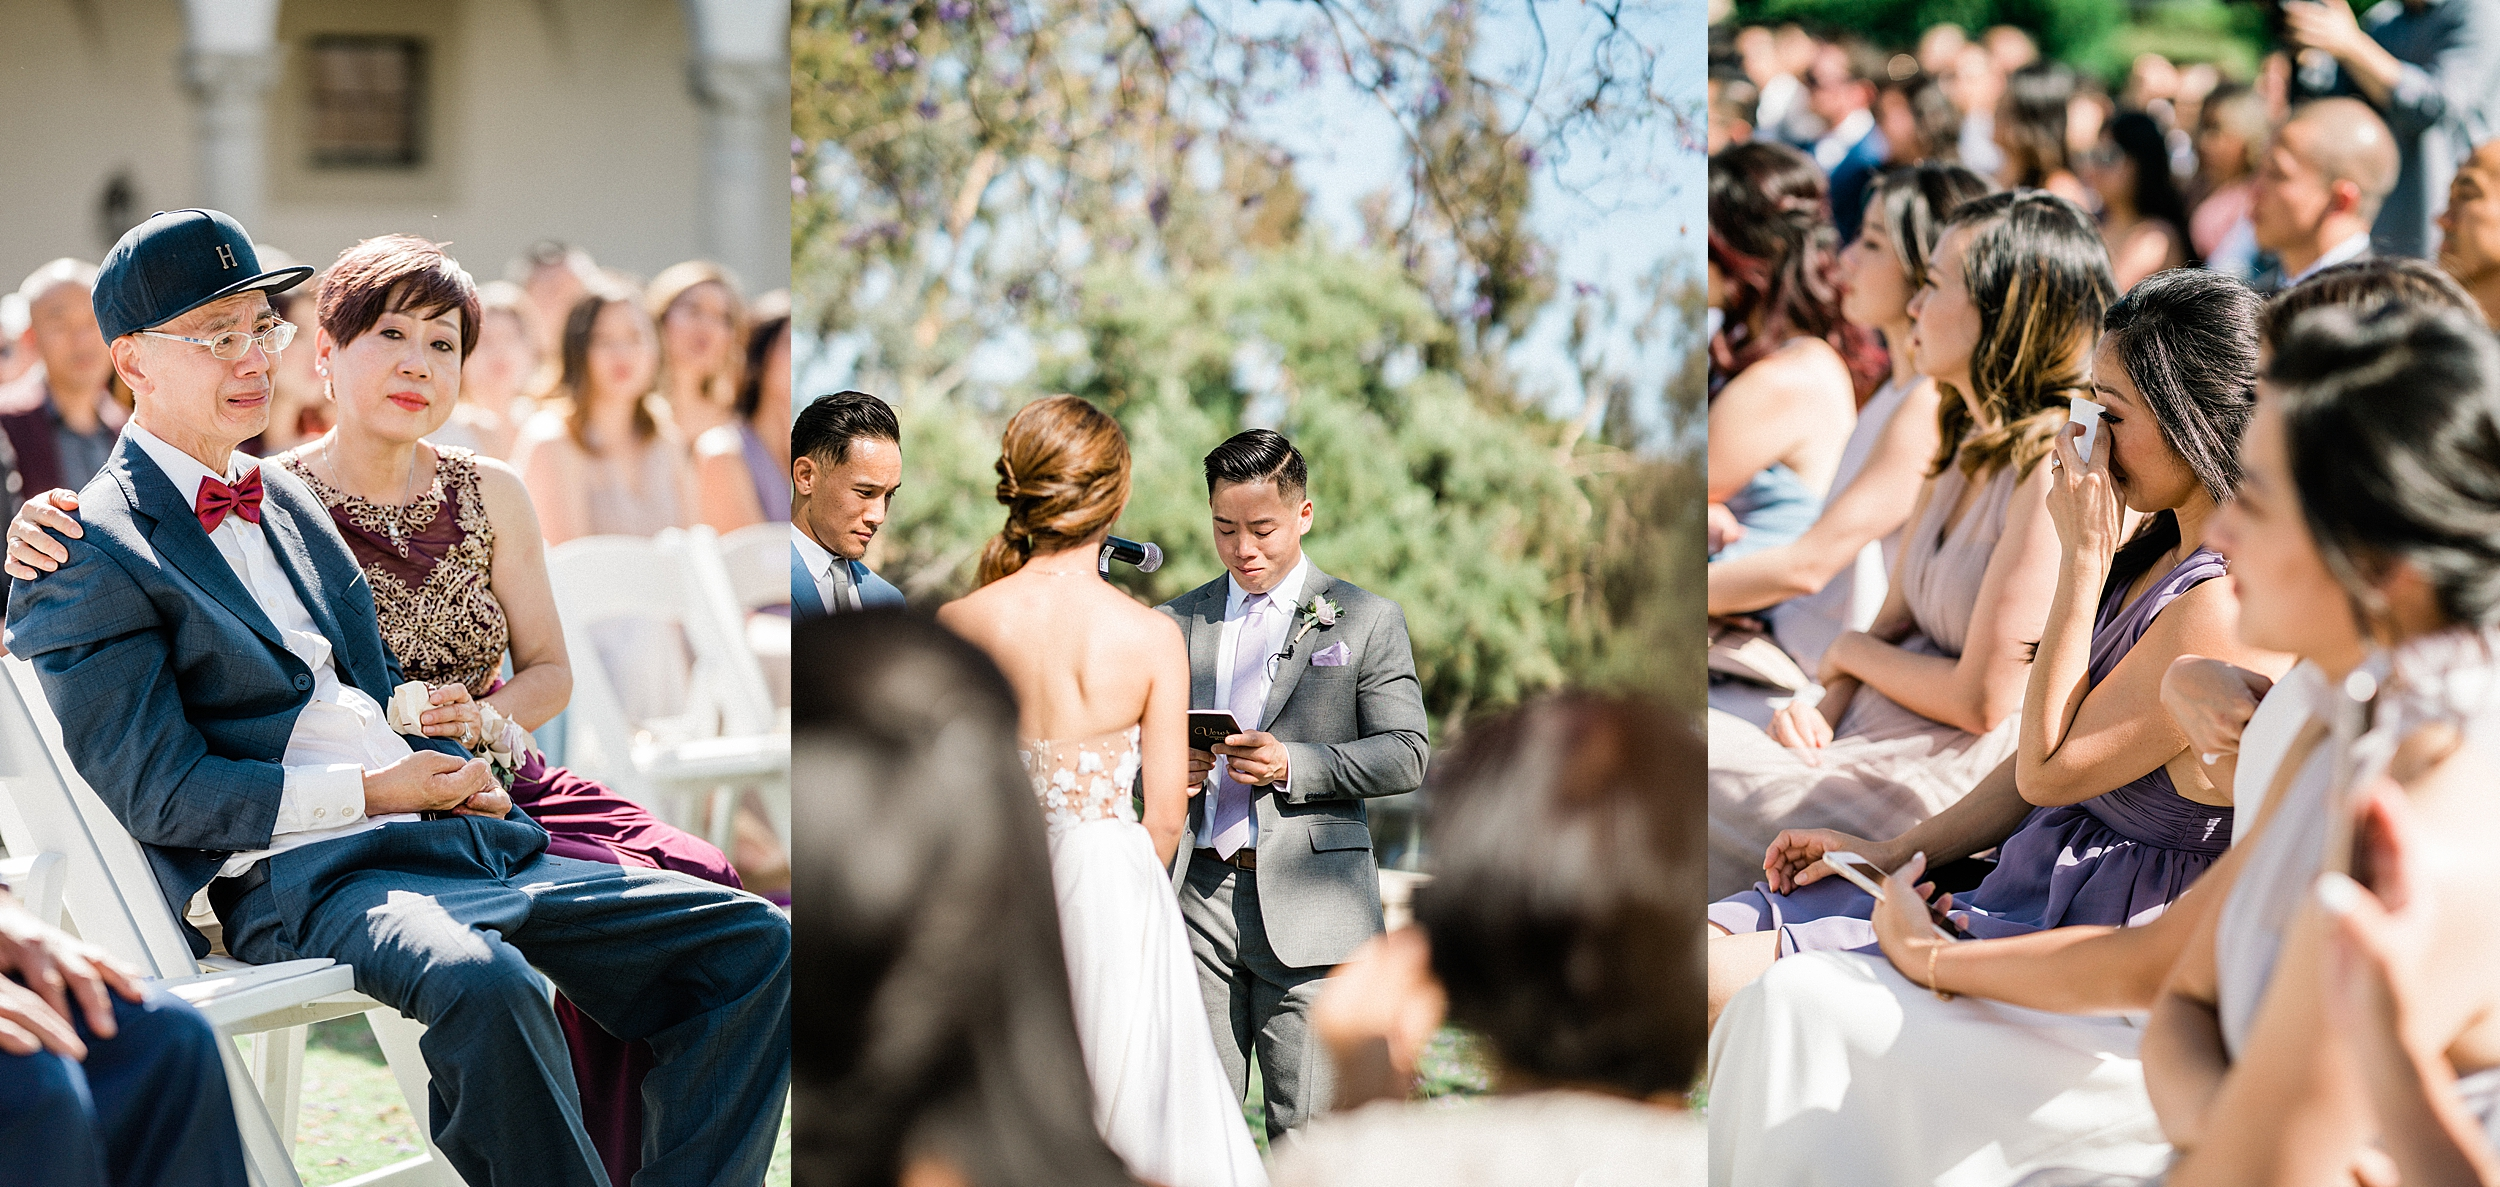 Caltech Wedding Stewart and Connie Photography_0012.jpg